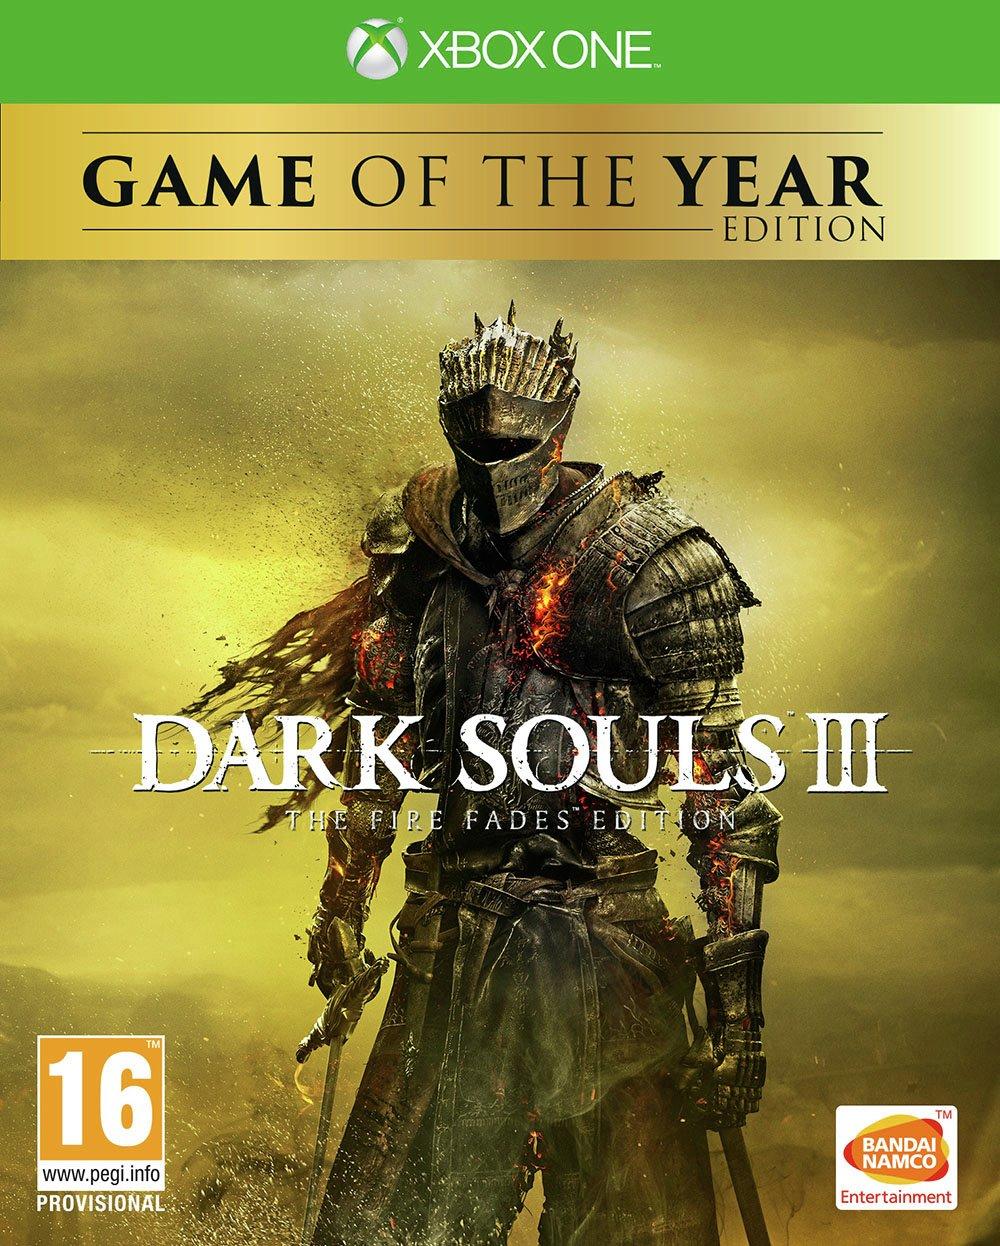 Dark Souls 3: Fire Fades GoTY Edition Xbox One Game.